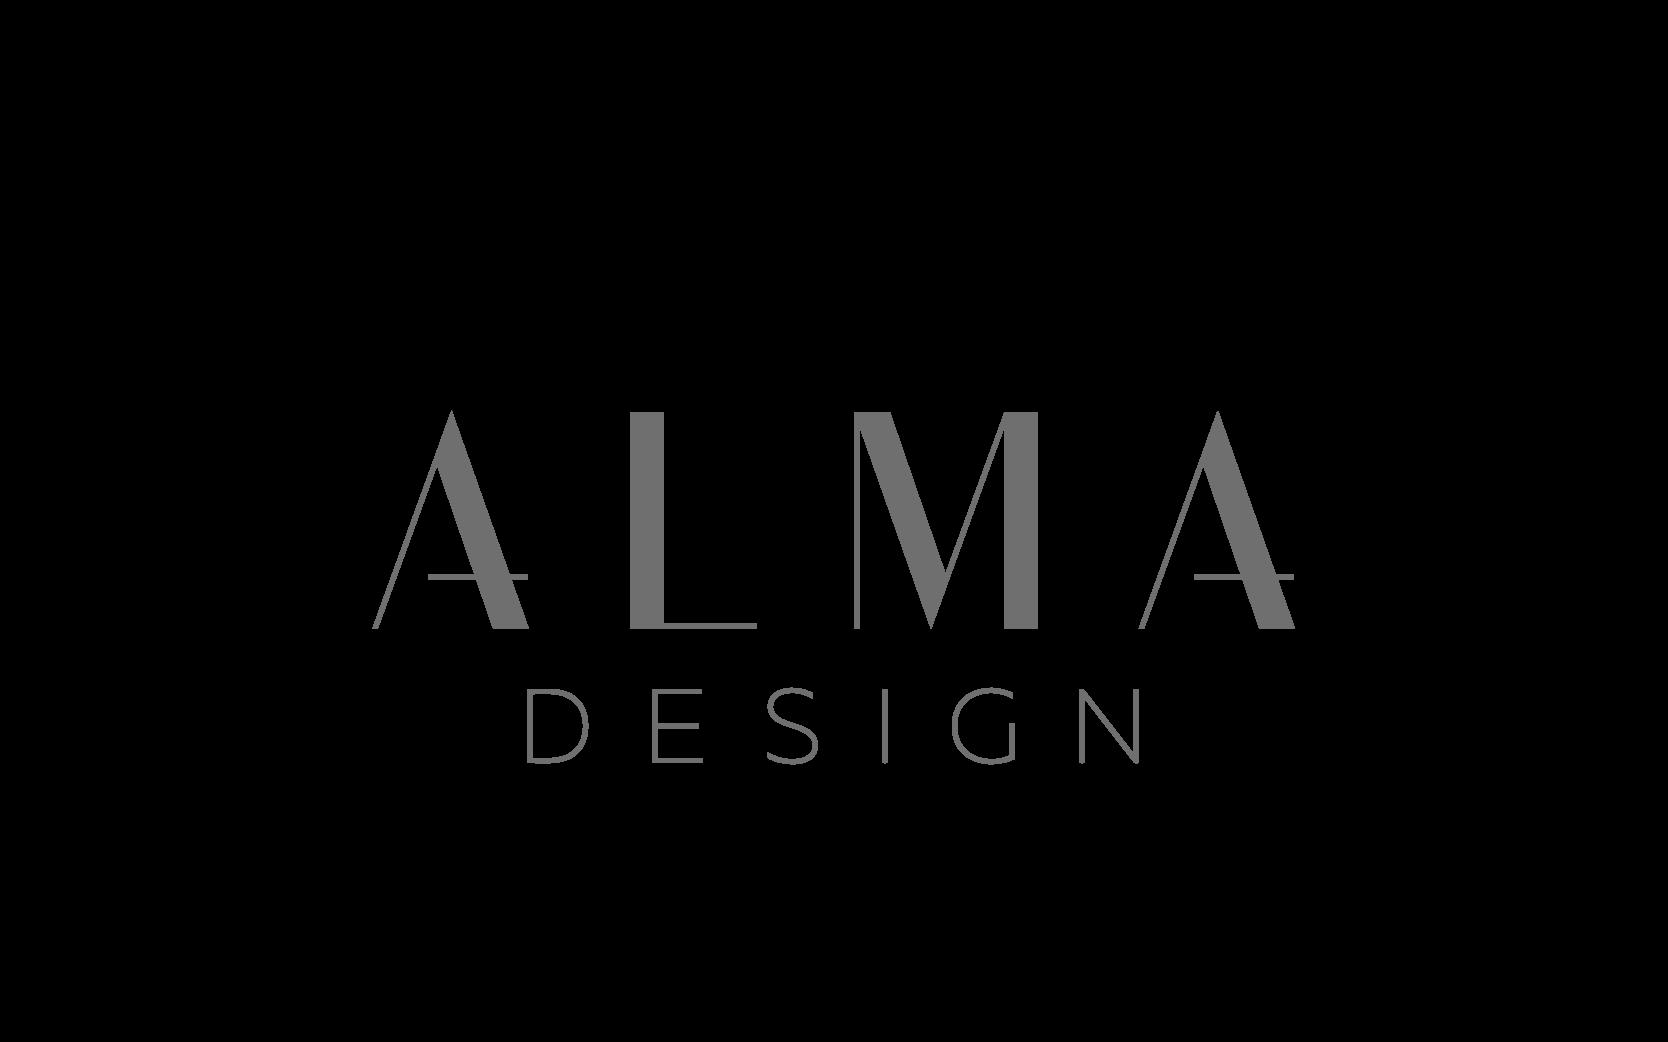 Alma Design